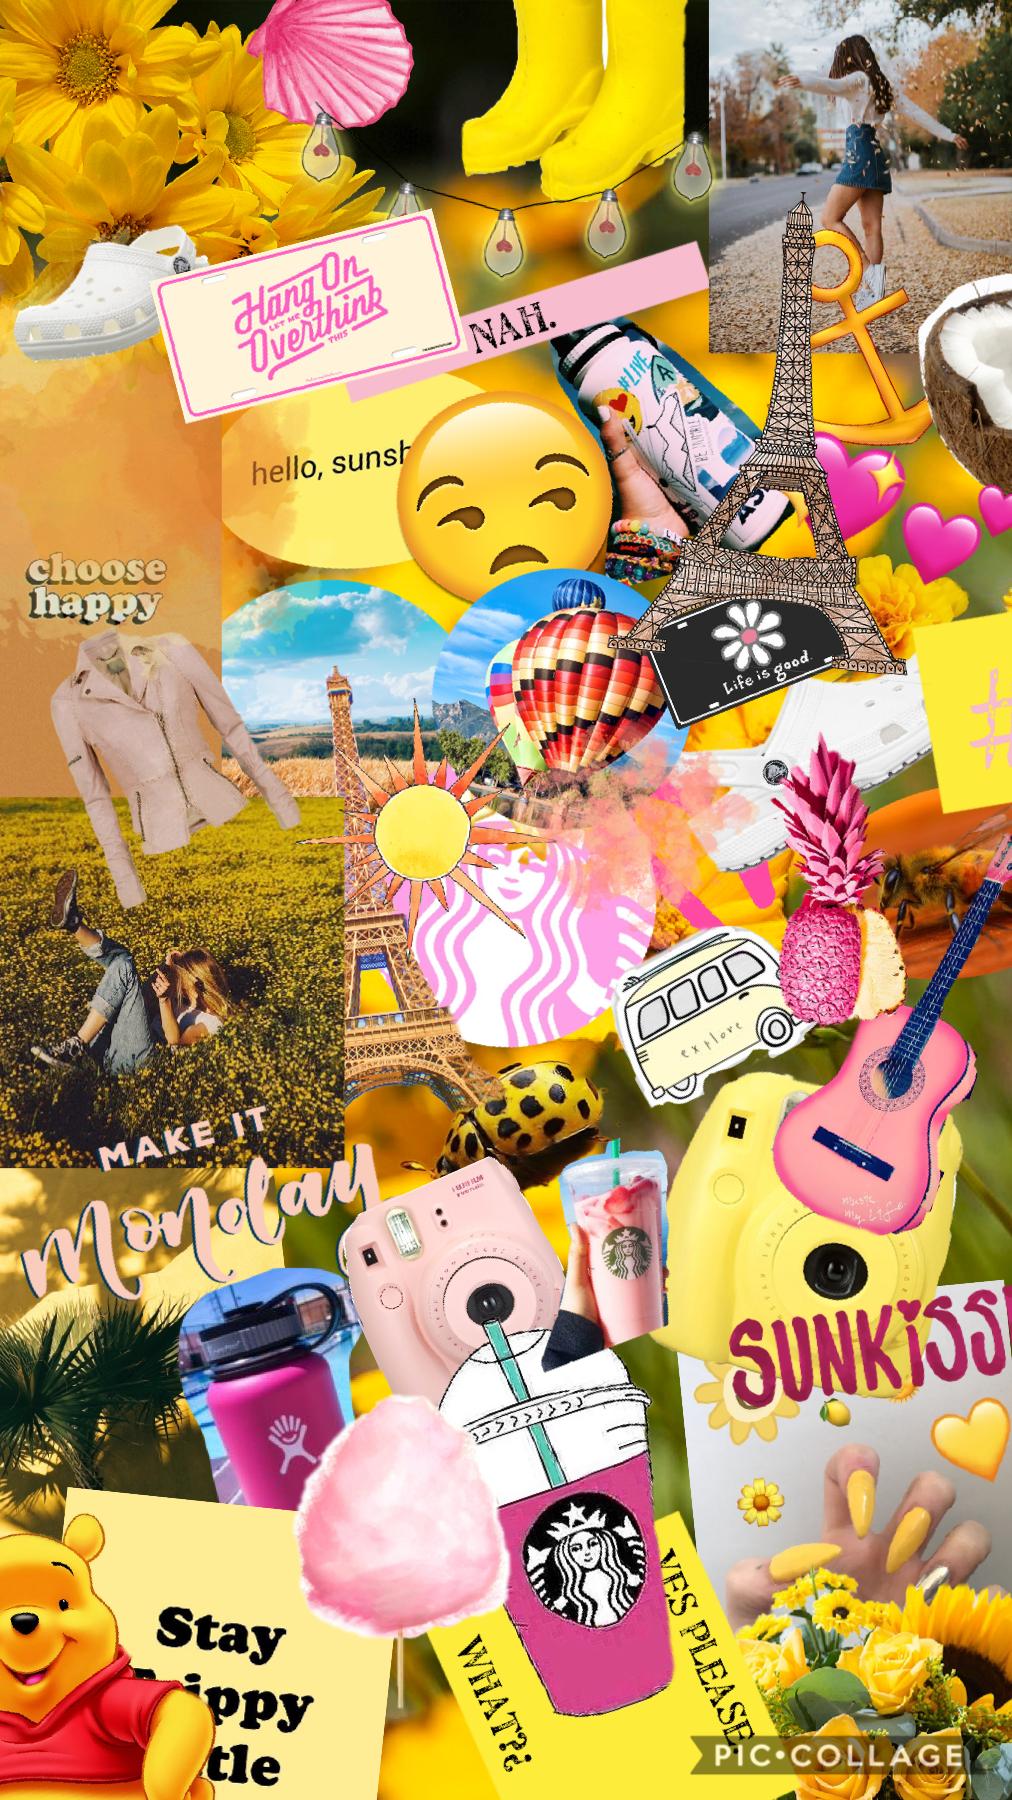 Collage by Runningrach